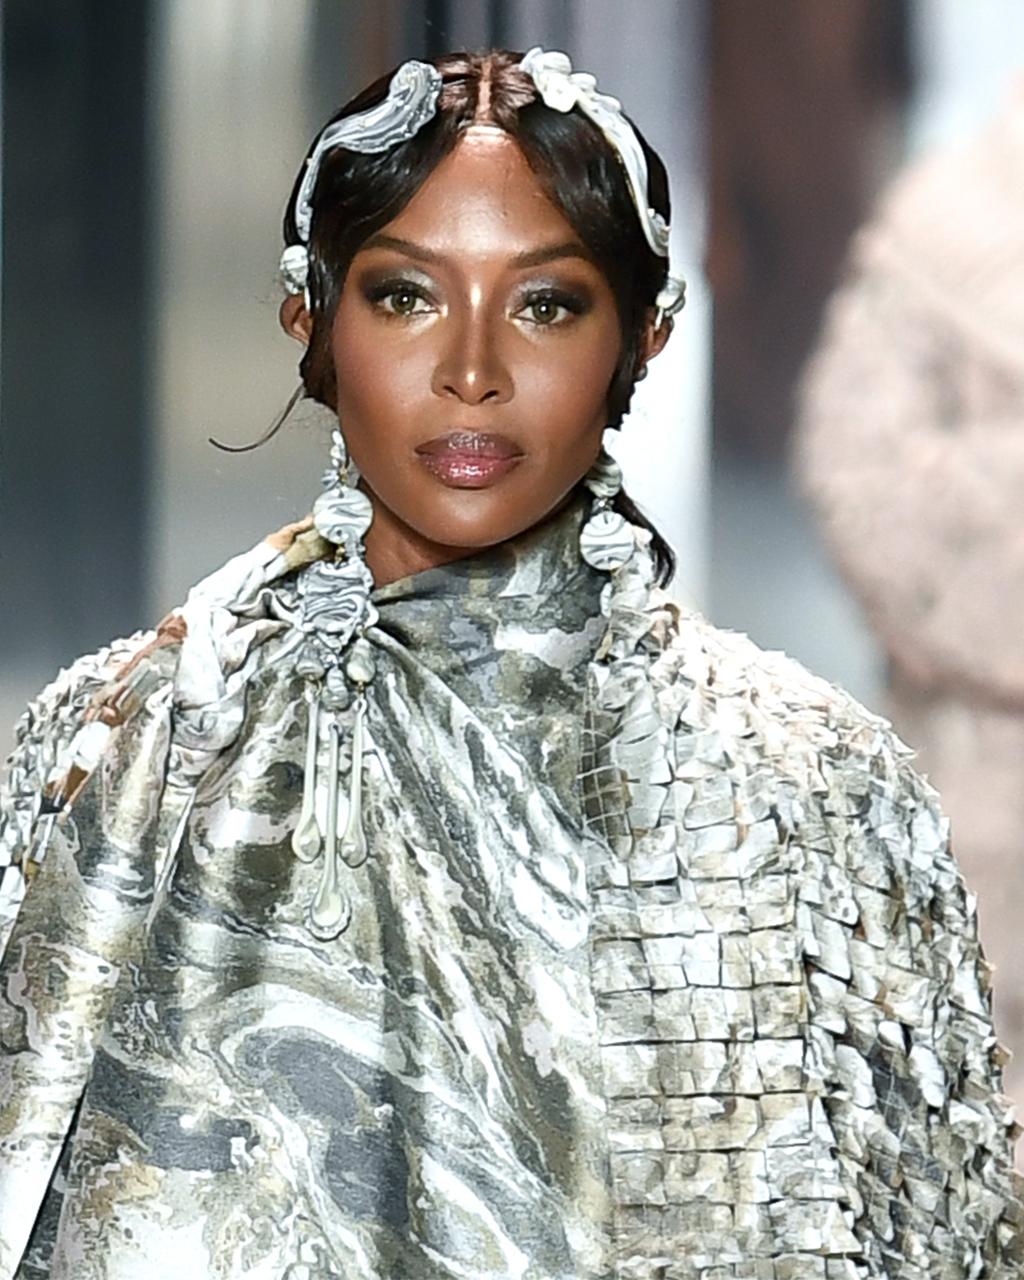 Fendi SS21 Haute Couture, Naomi Campbell